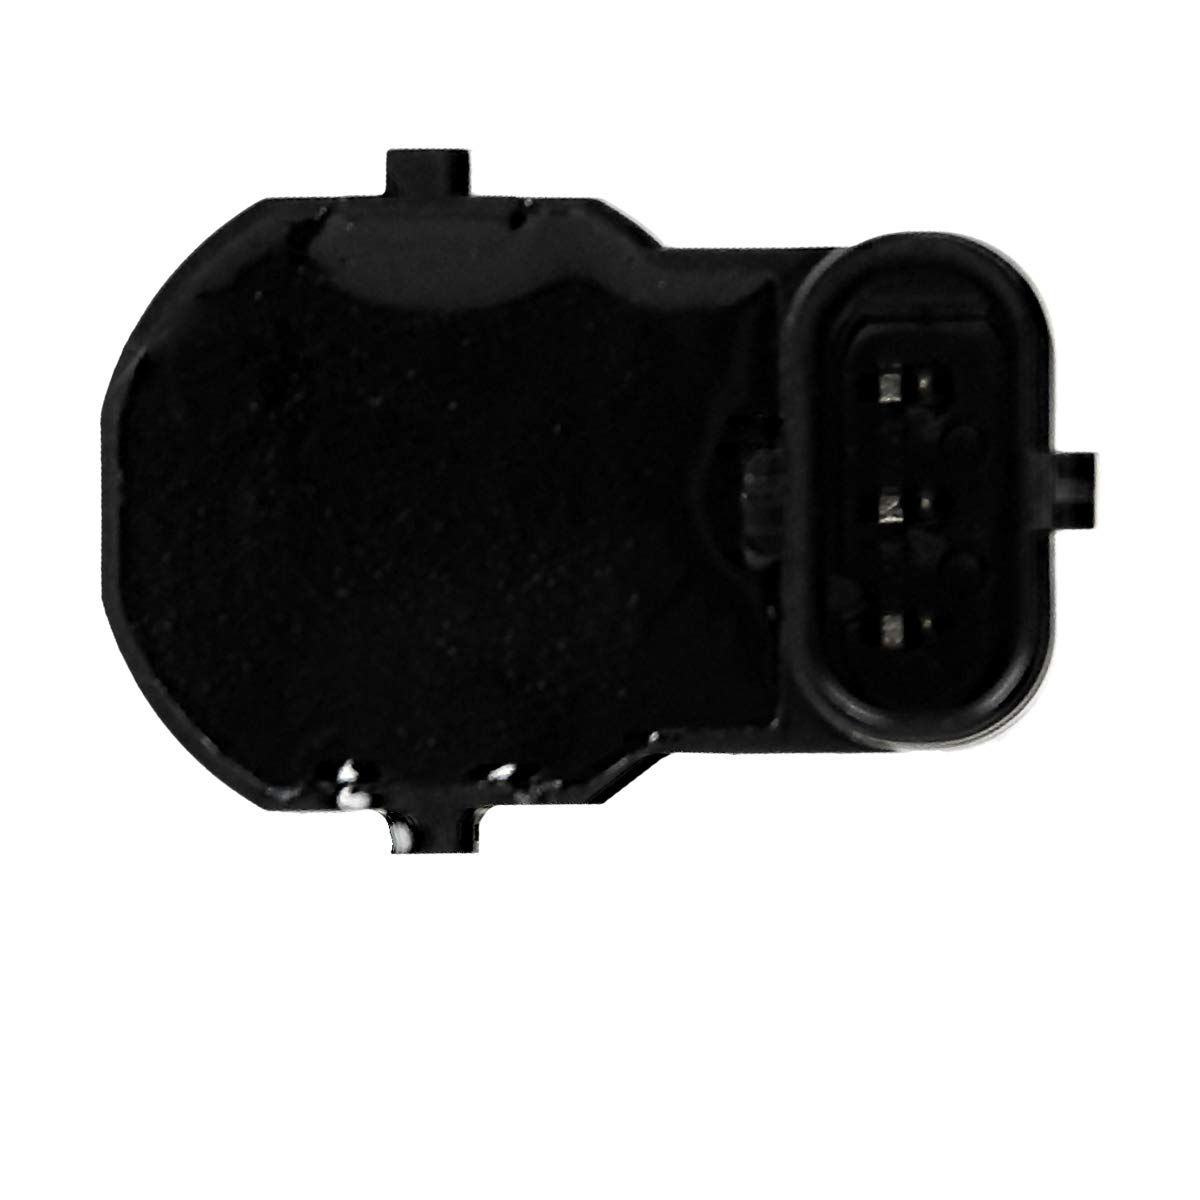 ECD Germany 2 x Einparkhilfe Parkhilfe Parksensor Sensor PDC Ultraschallsensor